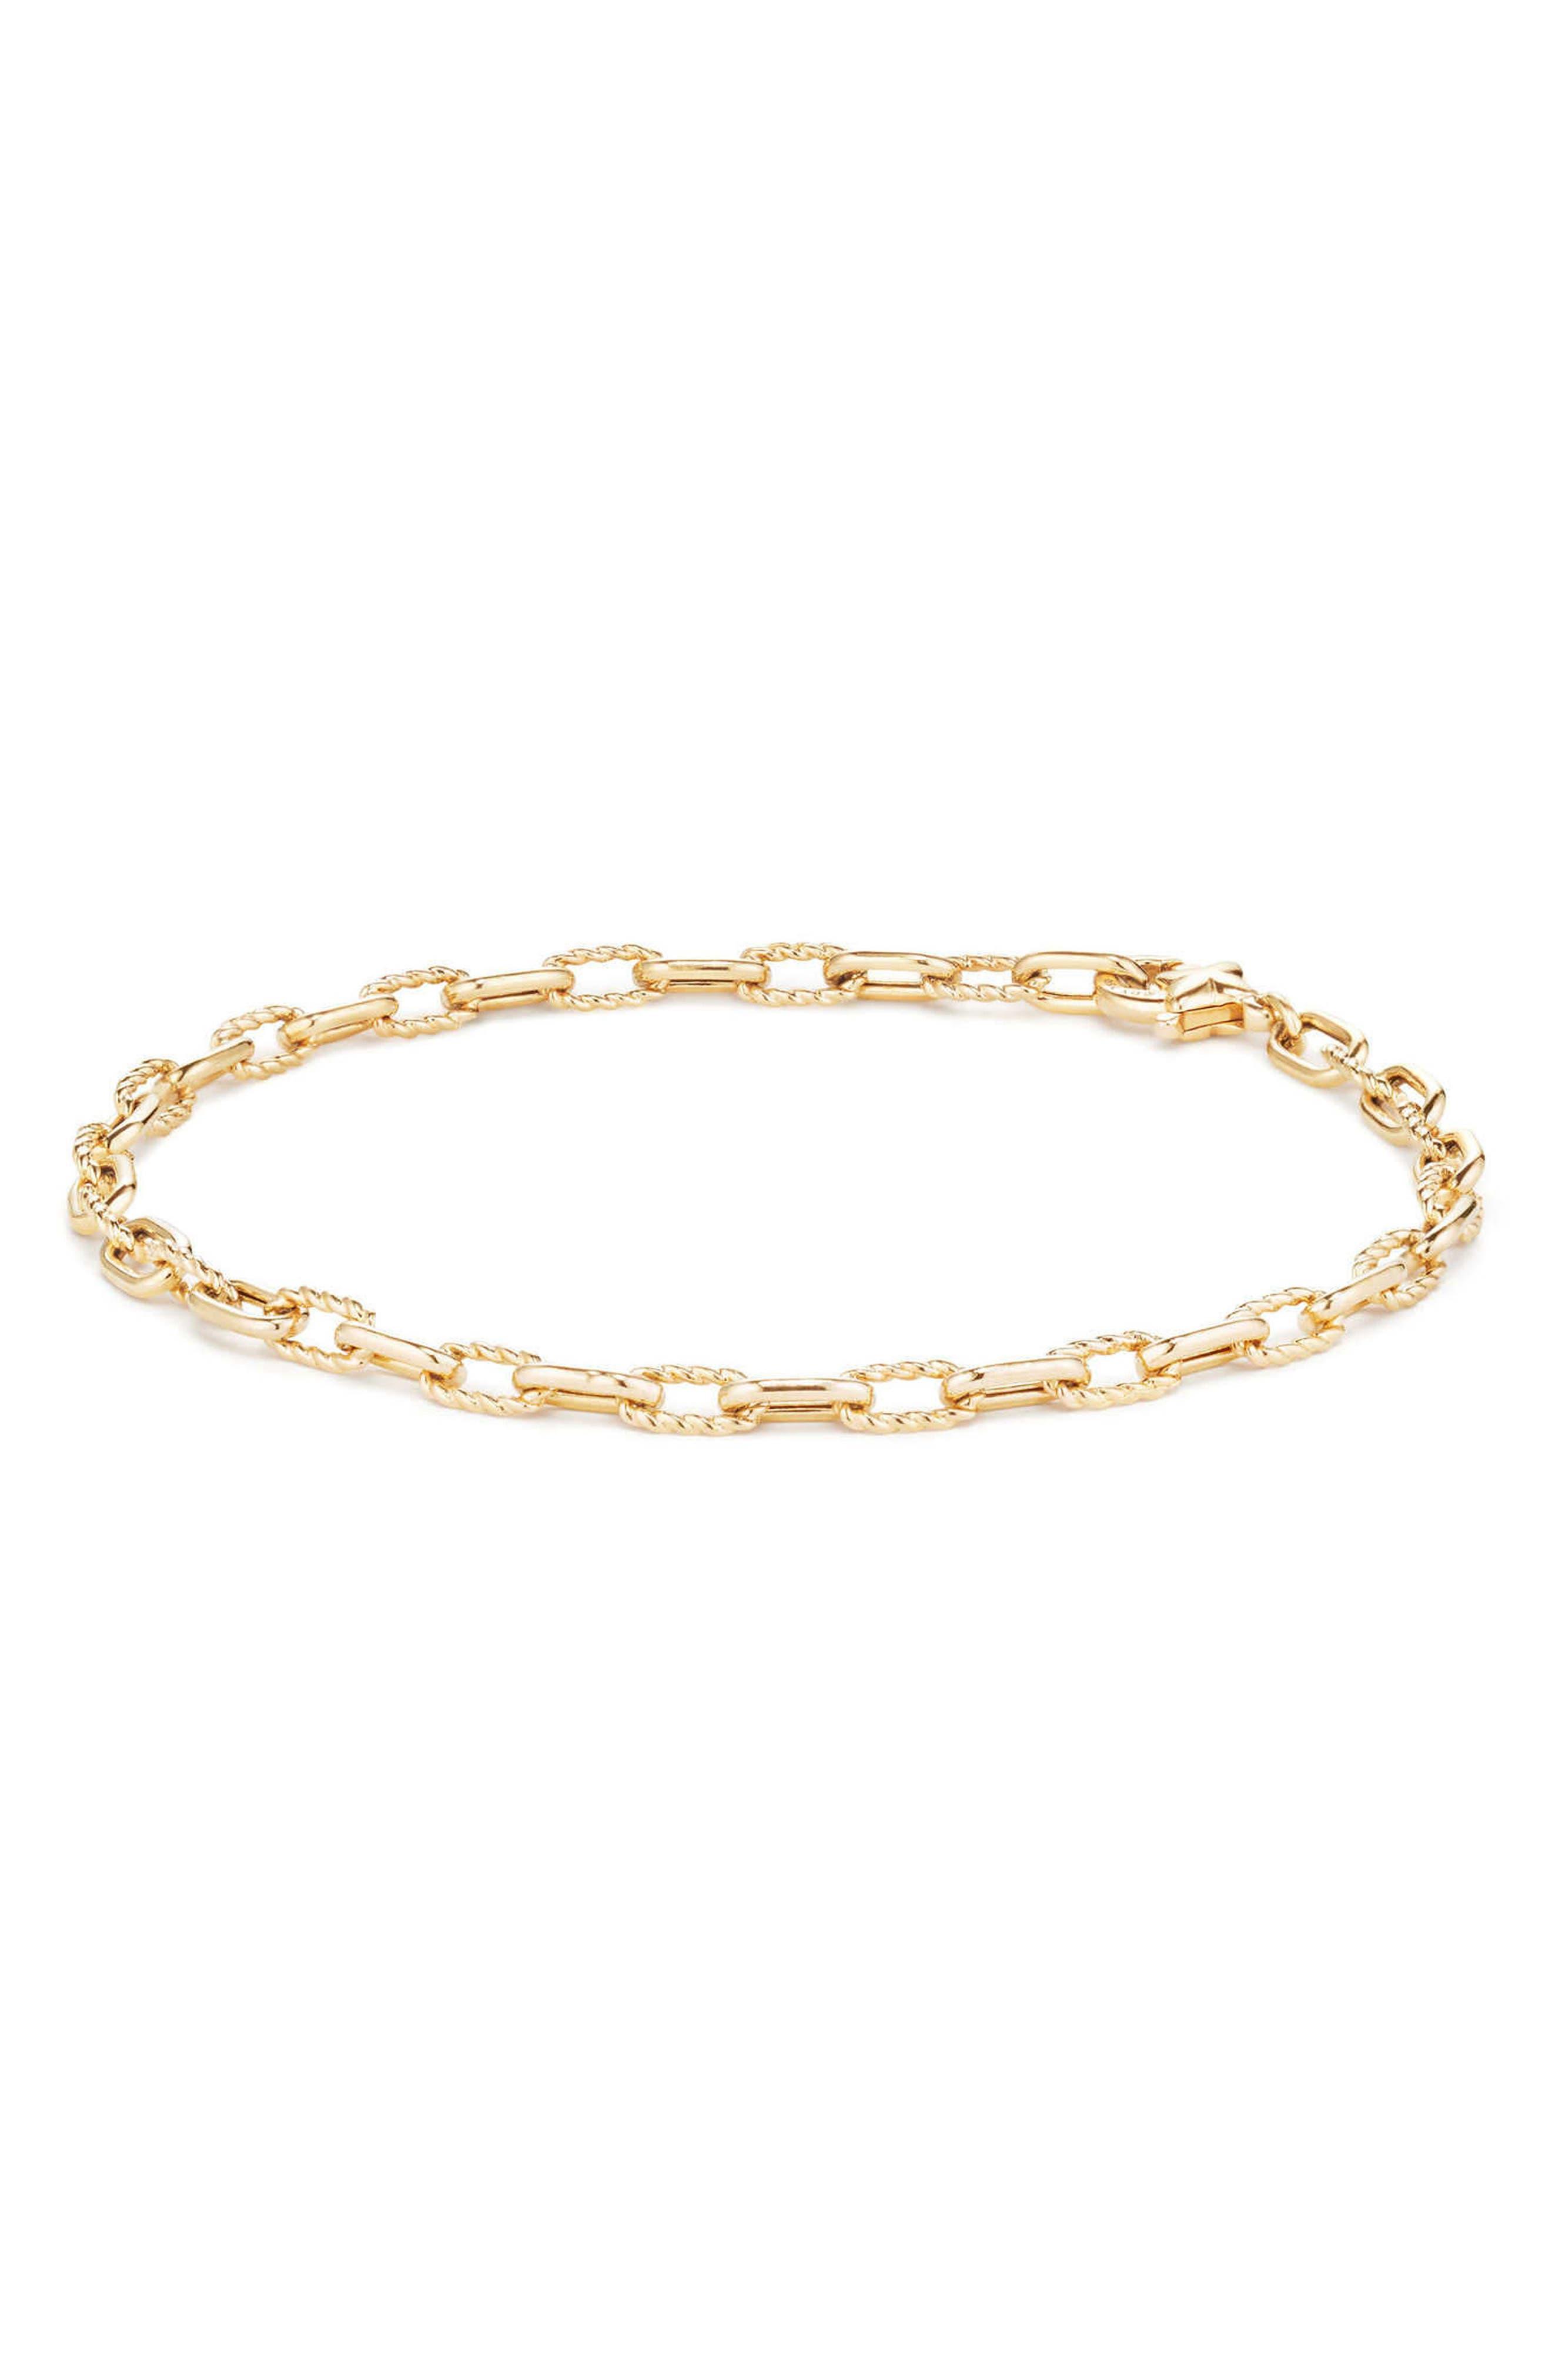 David Yurman DY Madison Thin Bracelet in 18K Gold